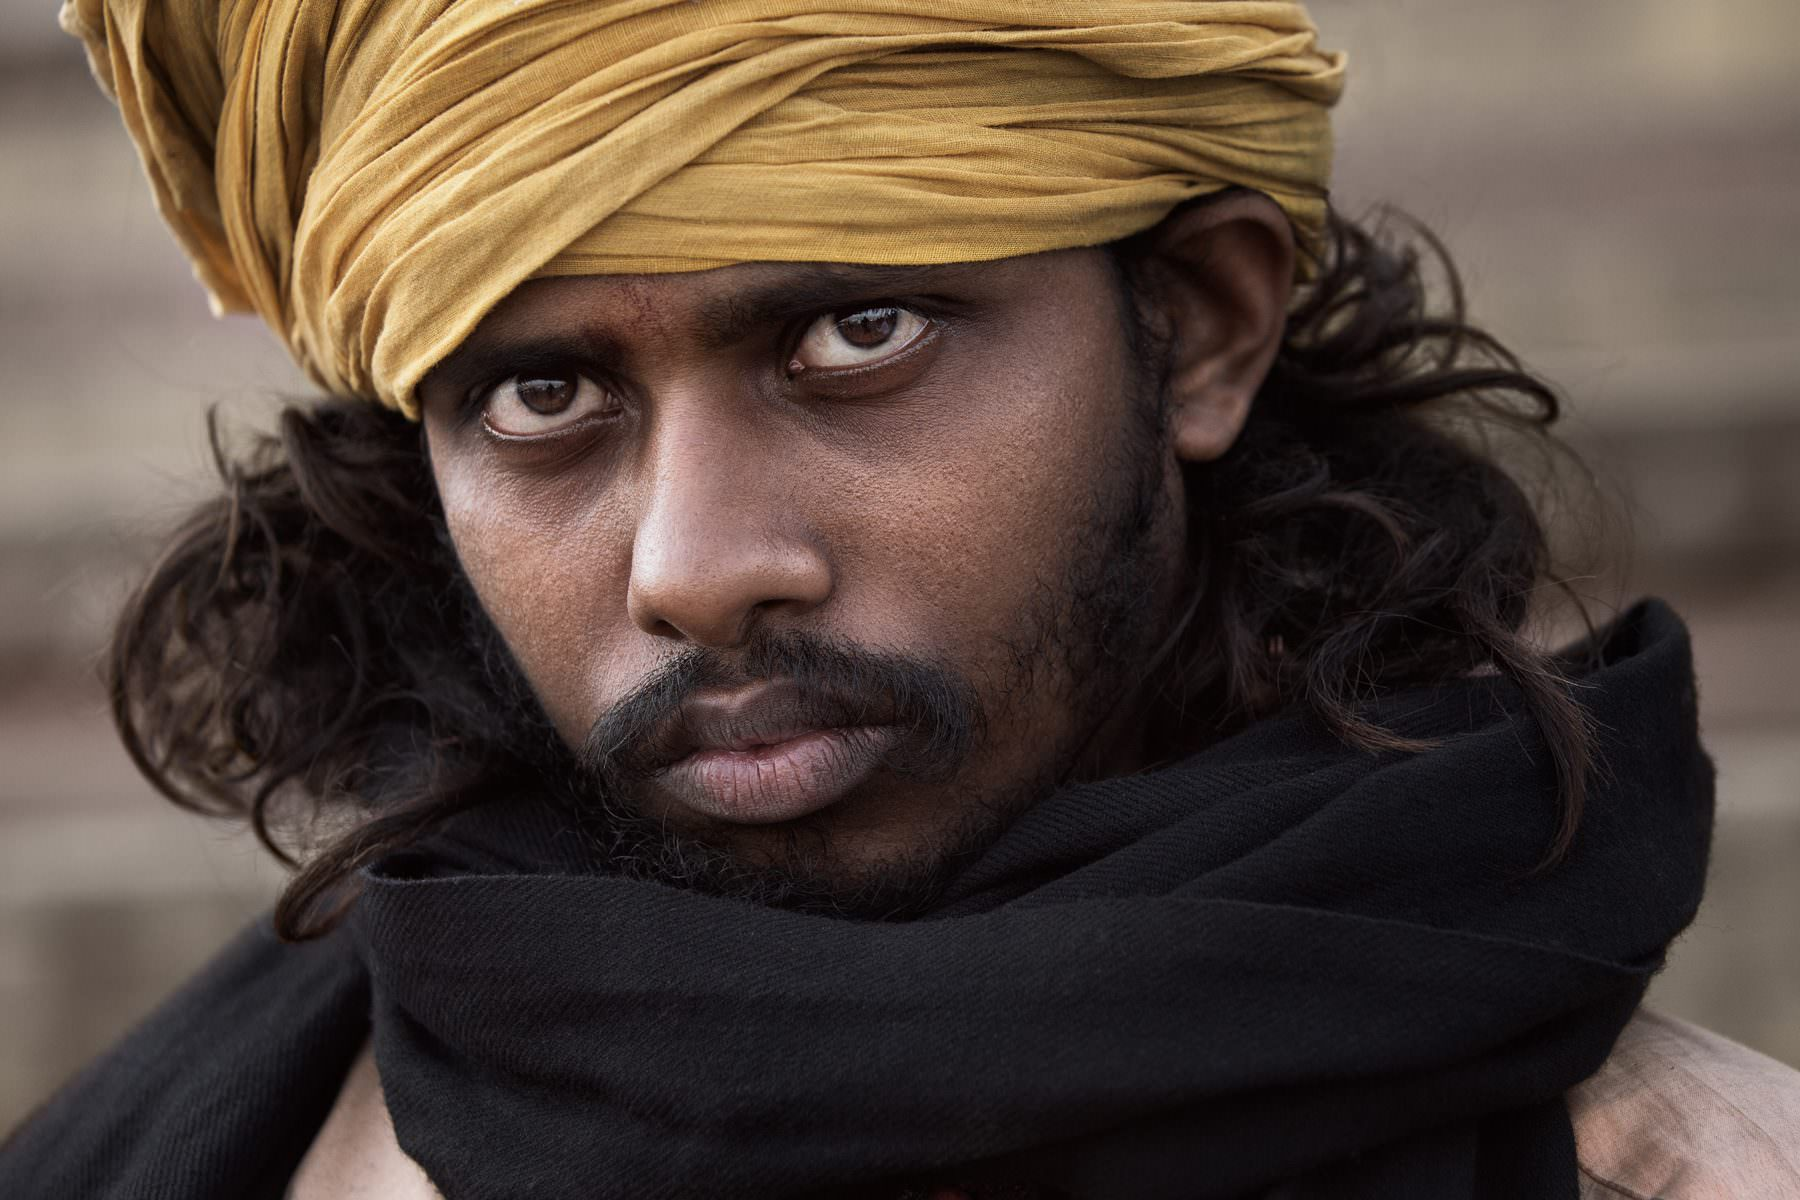 Portraits of holy men, Tamil, Sadhu, India / Varanasi / Benares / Kashi Copyright © by Gerry Pacher